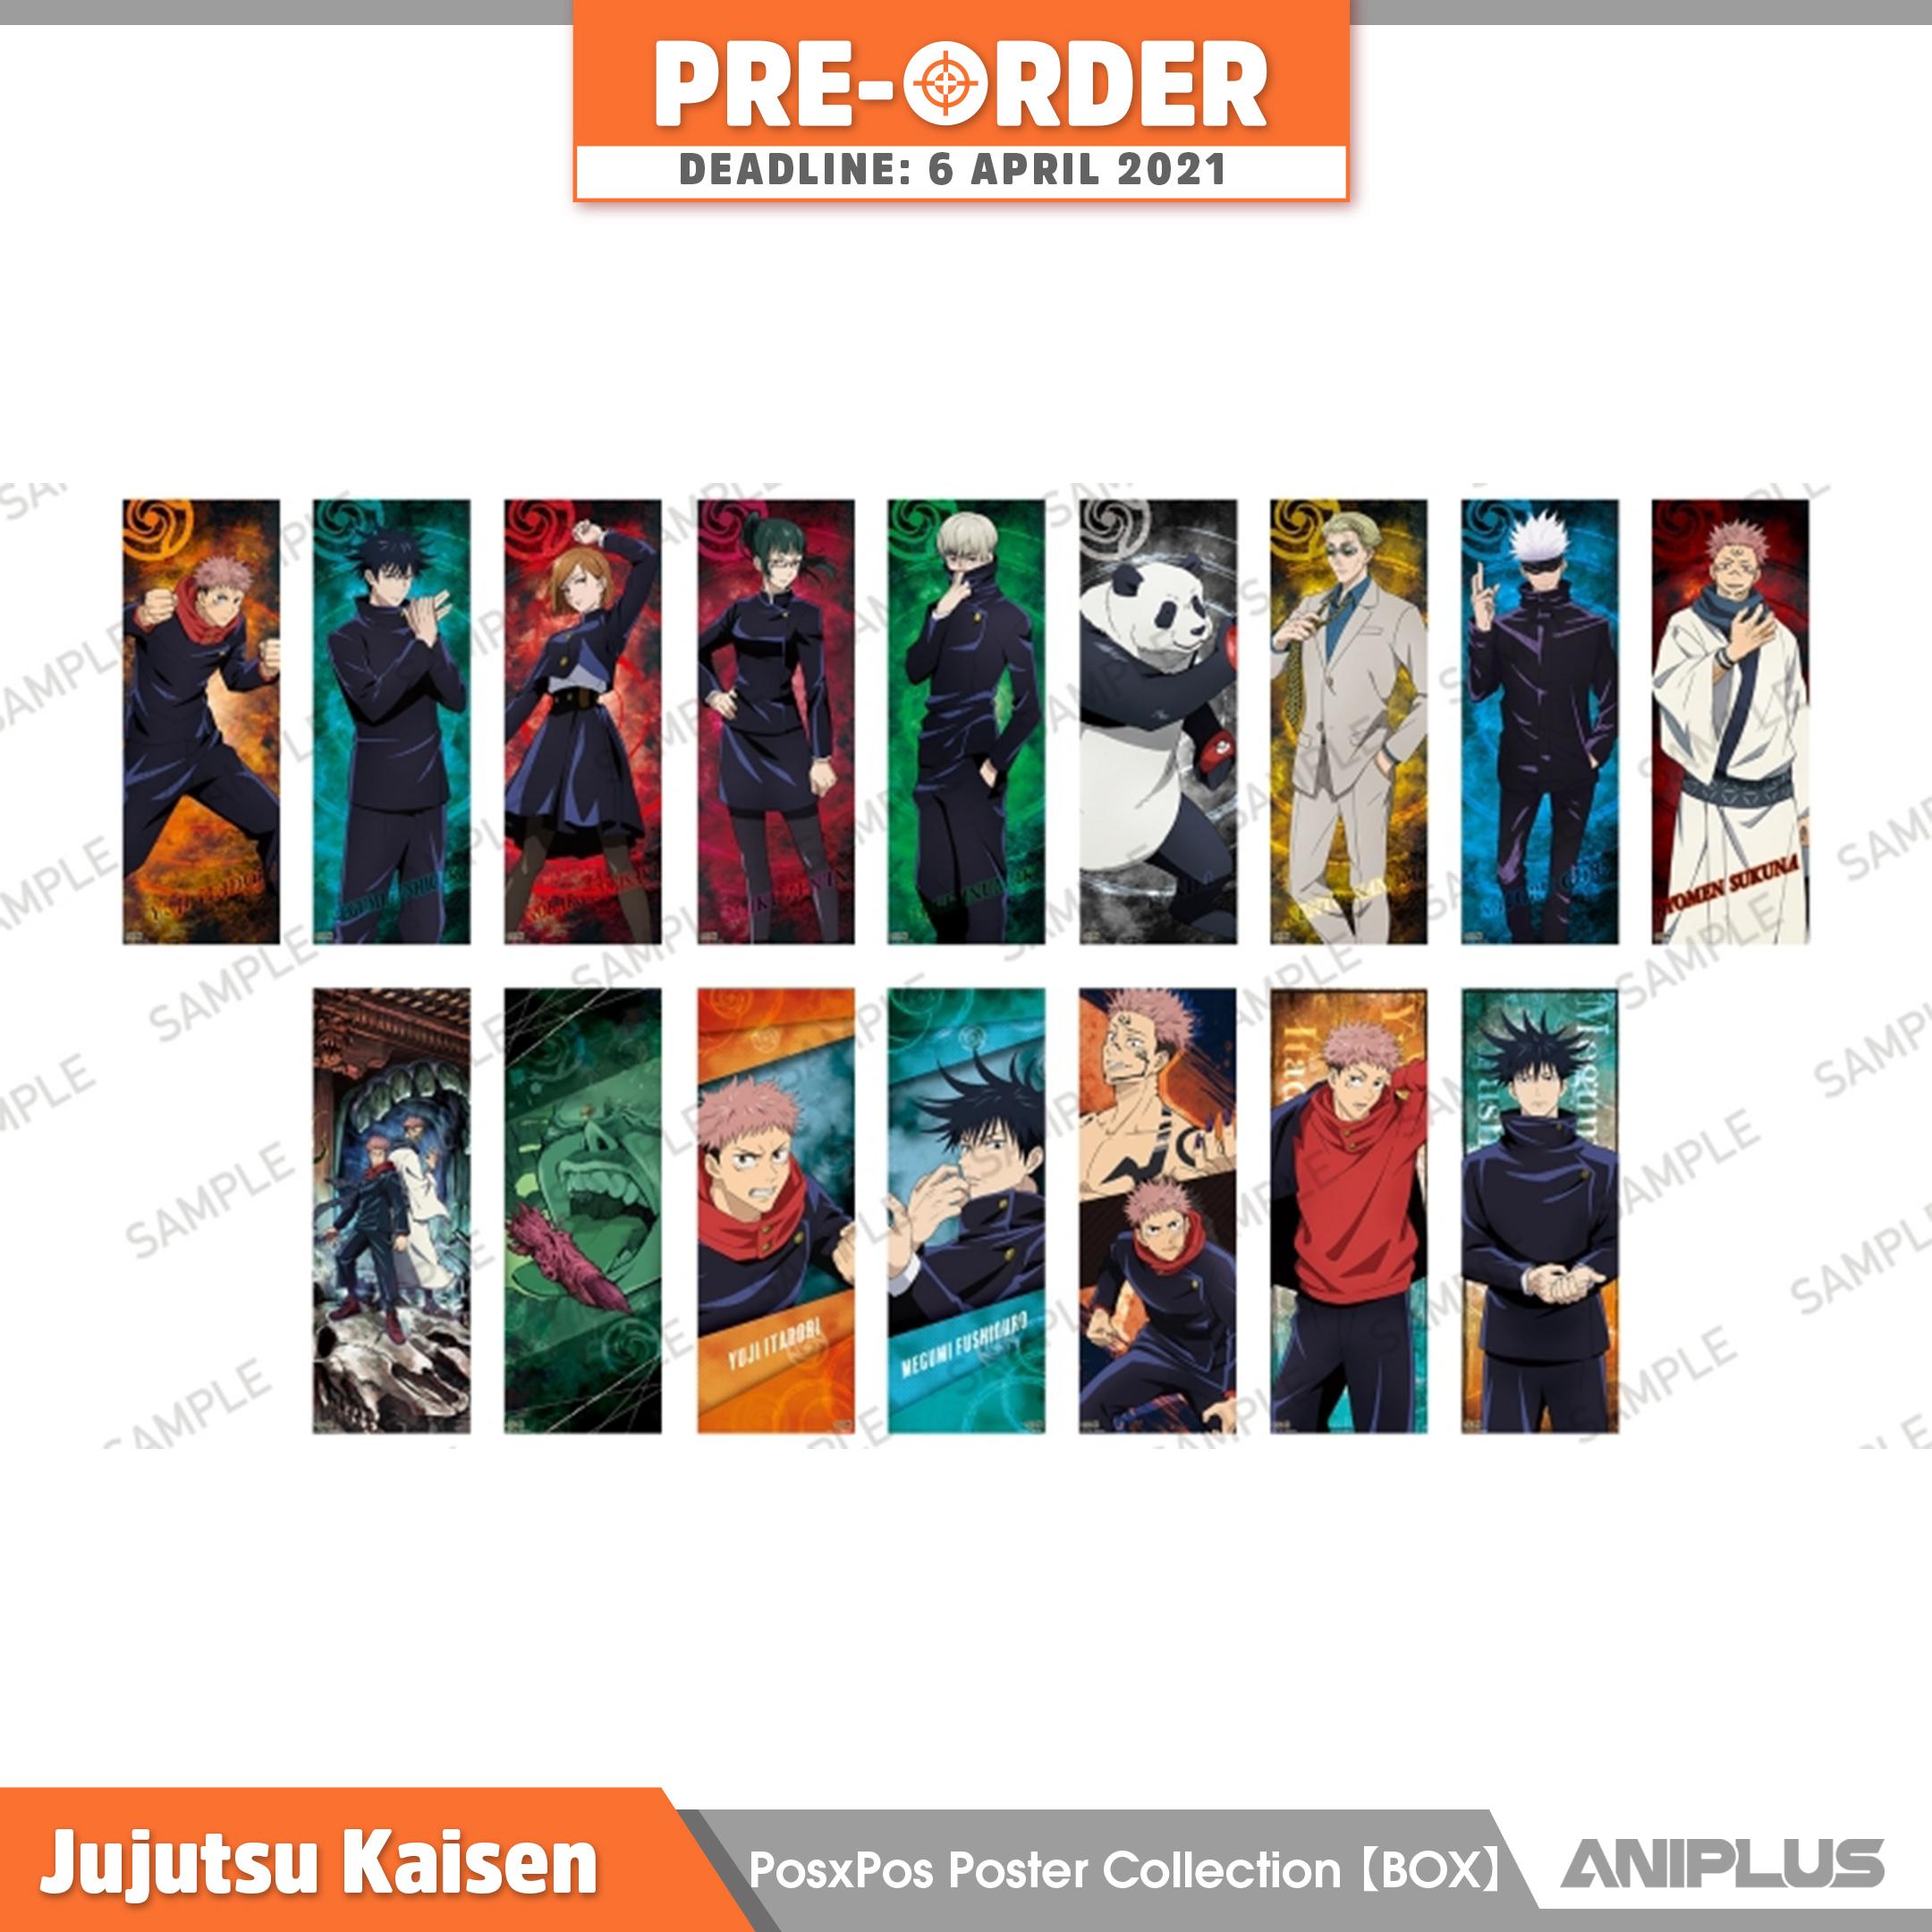 Jujutsu Kaisen PosxPos Poster Collection BOX